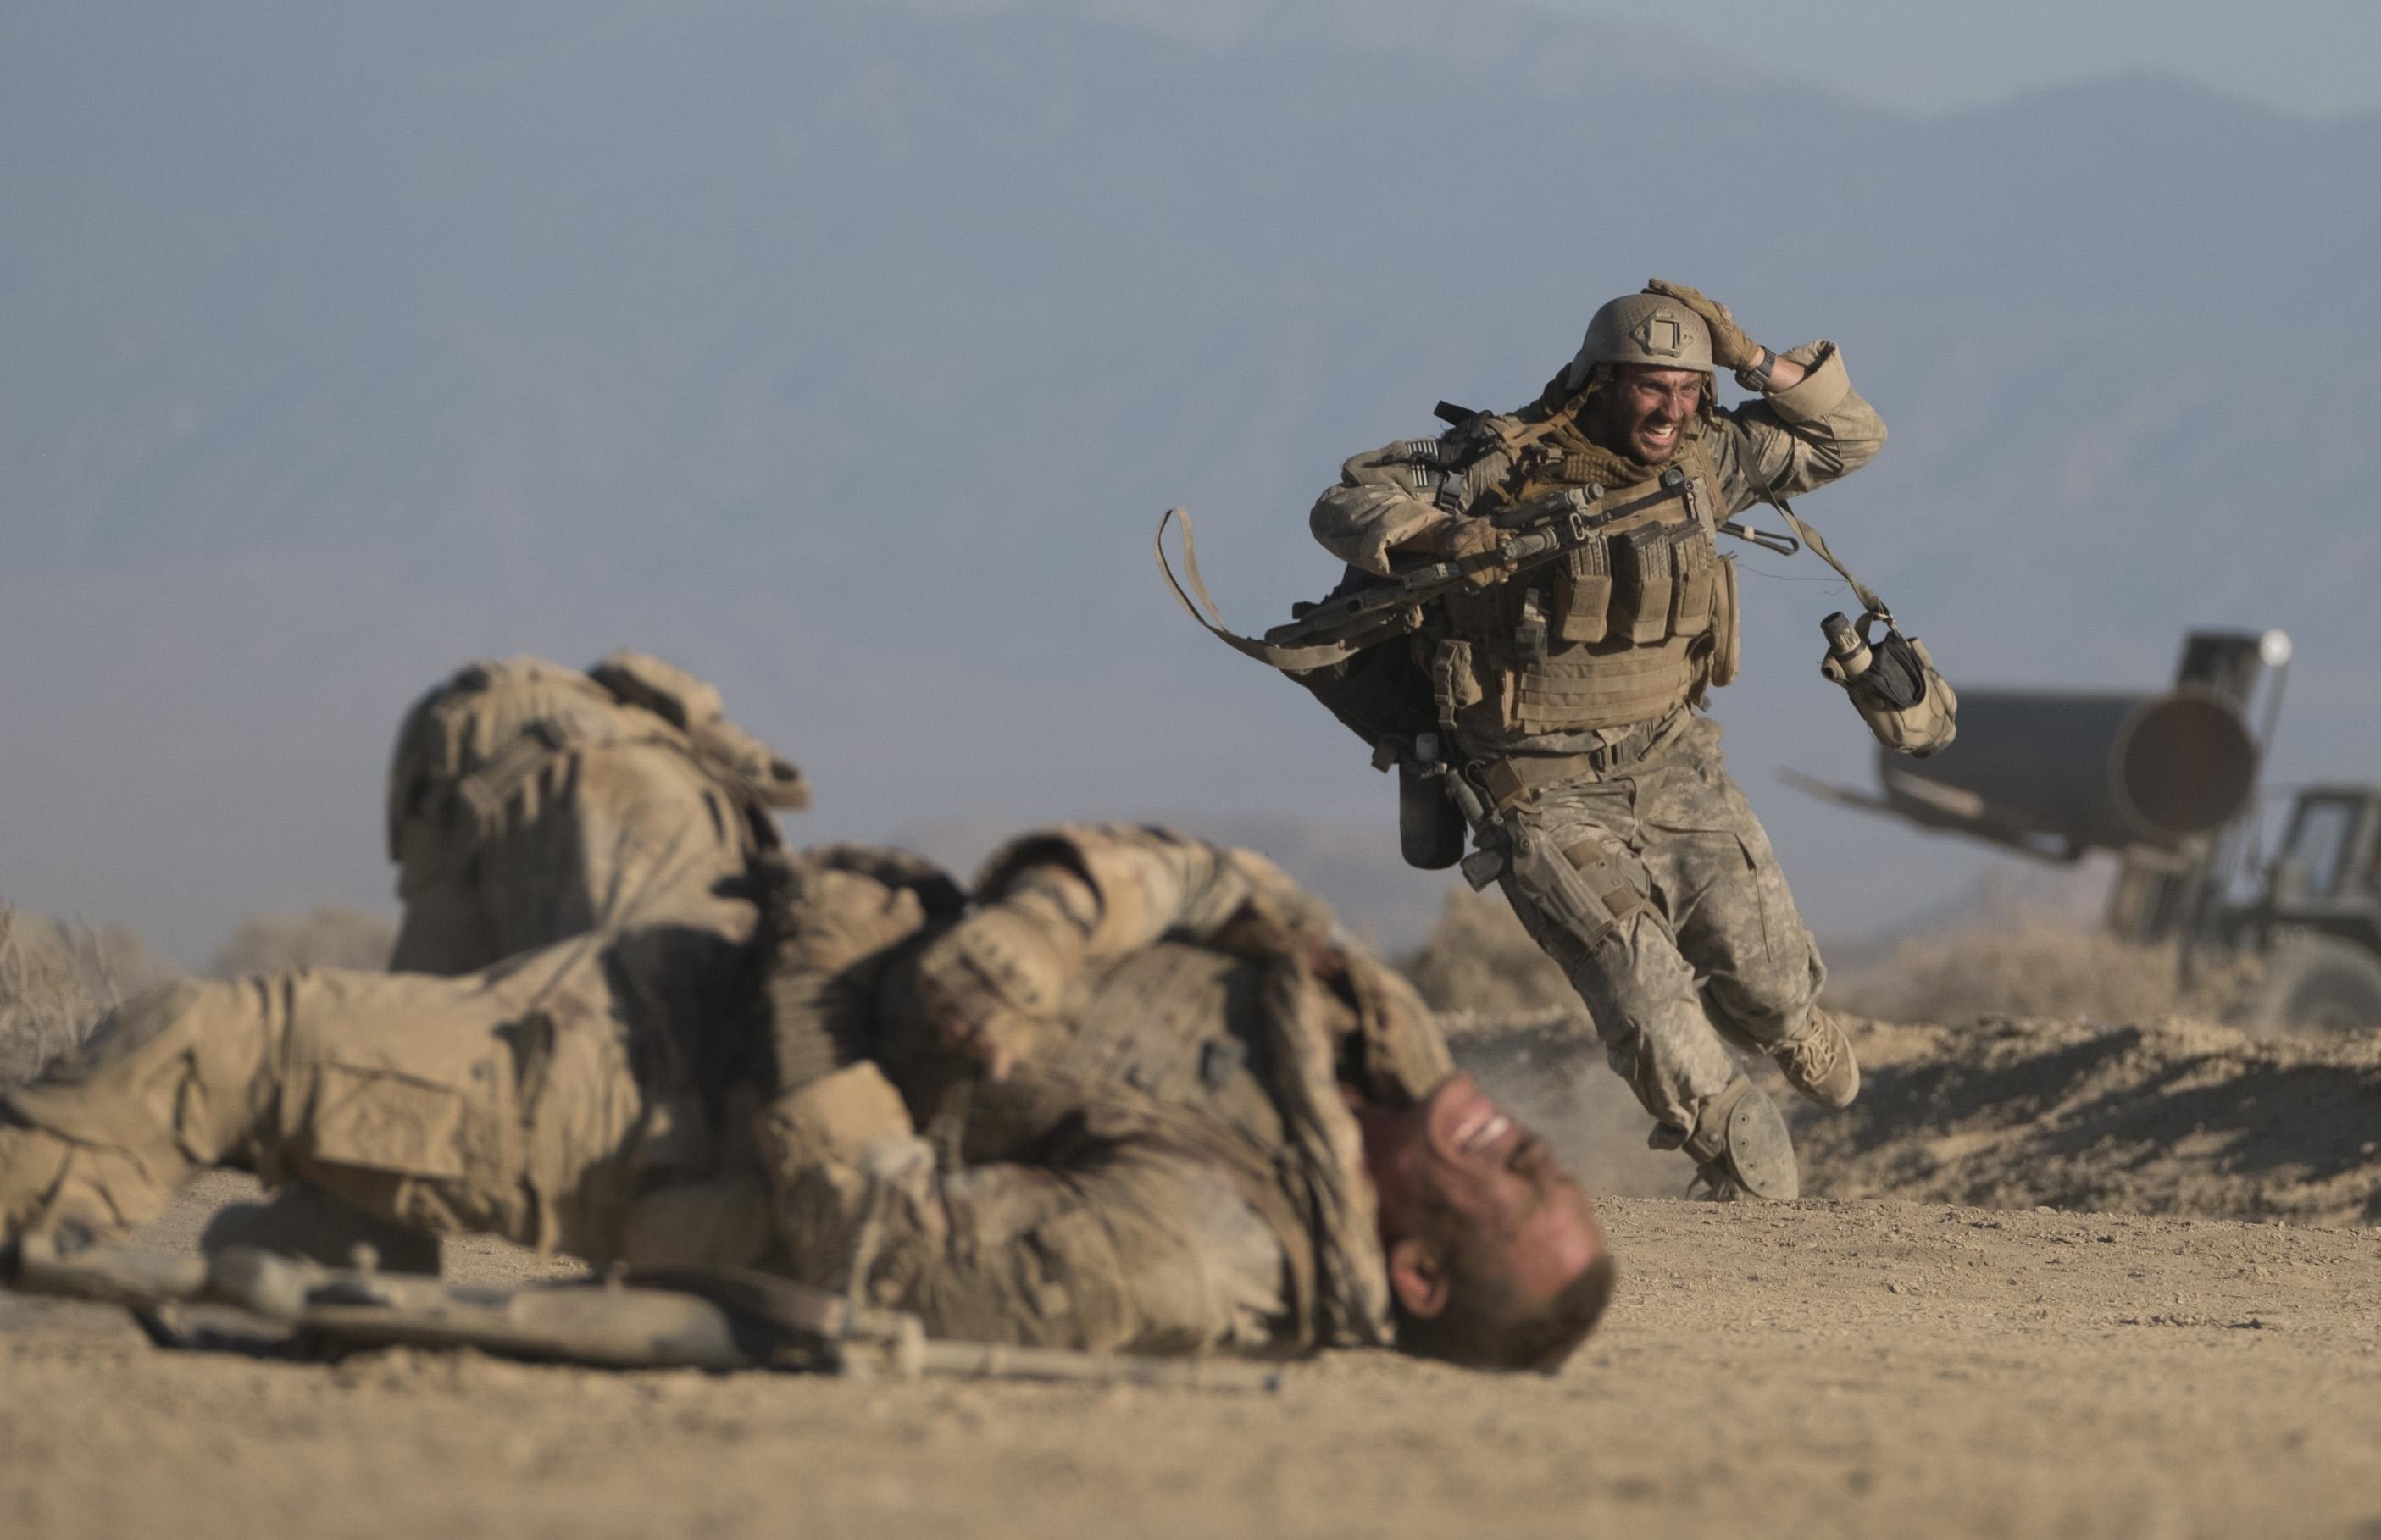 War in iraq world domination summary